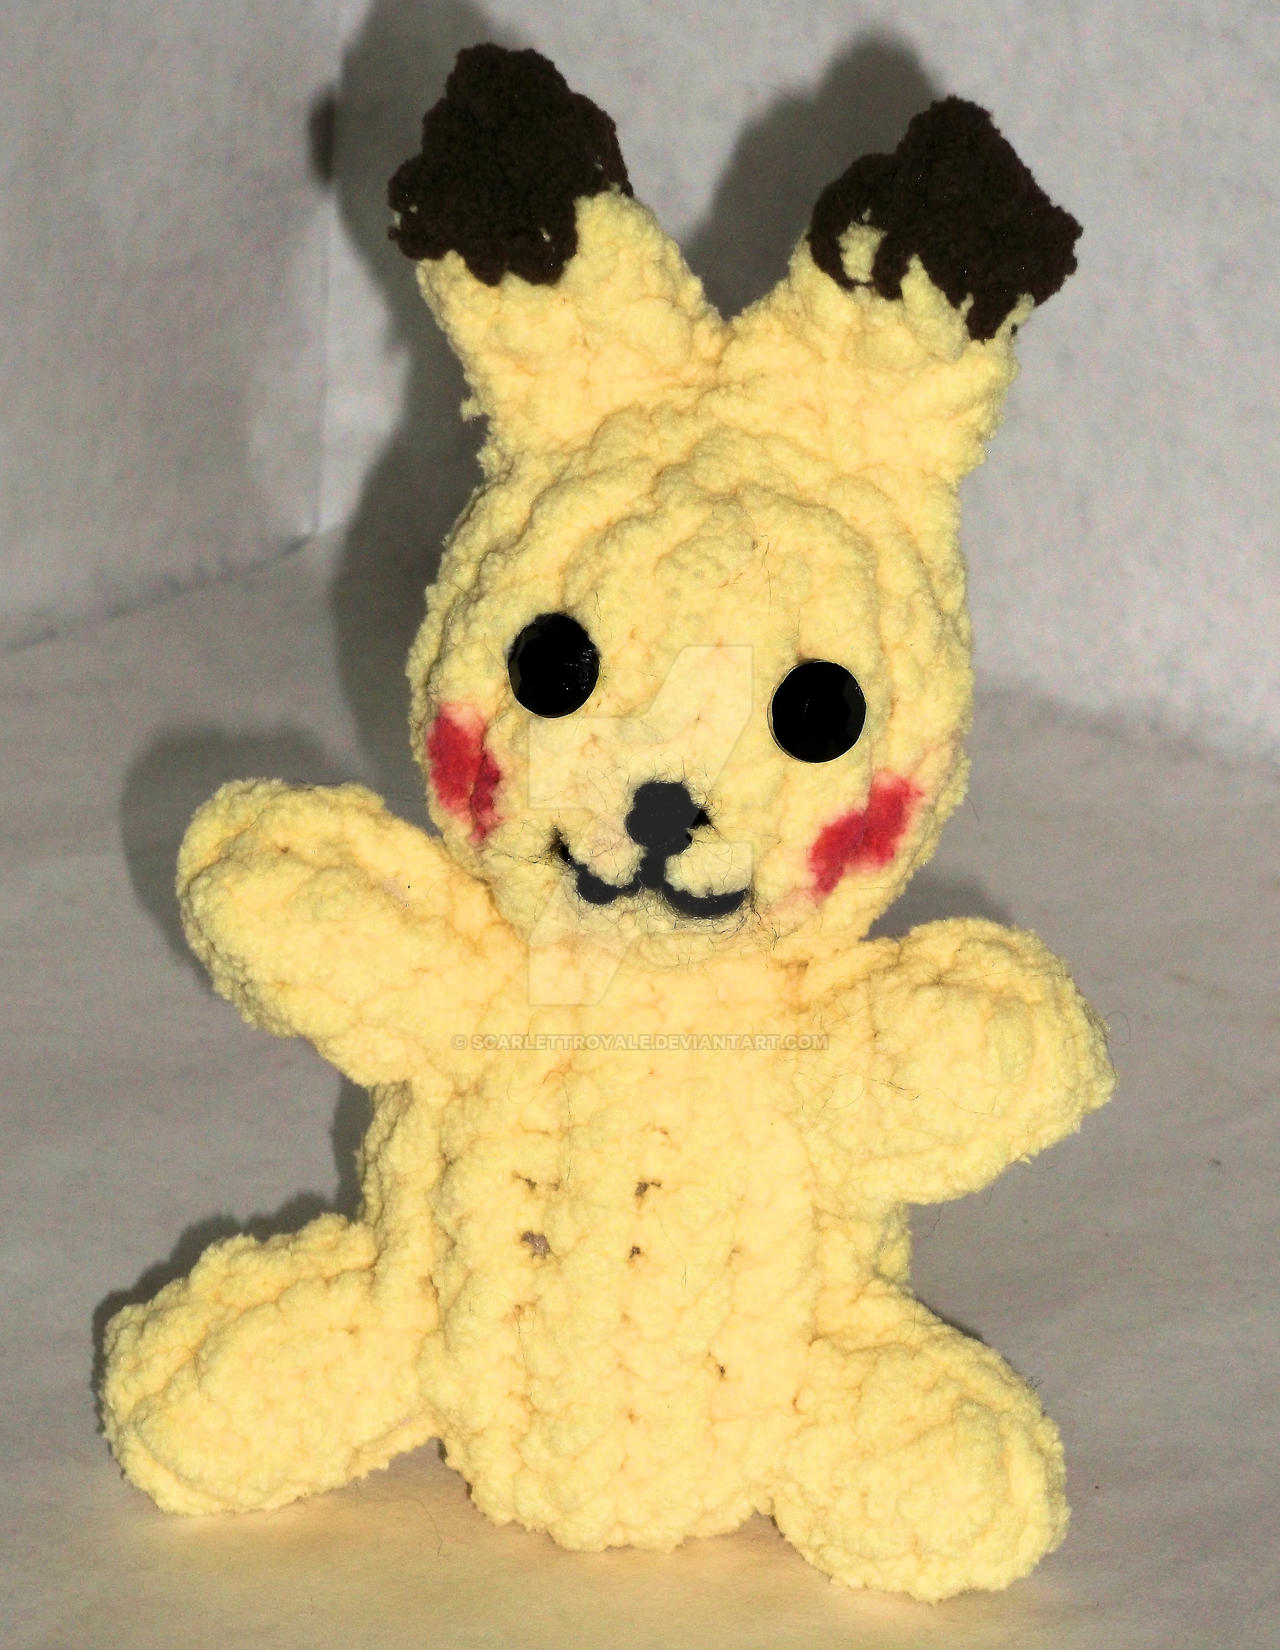 Loom Knit Pikachu by ScarlettRoyale